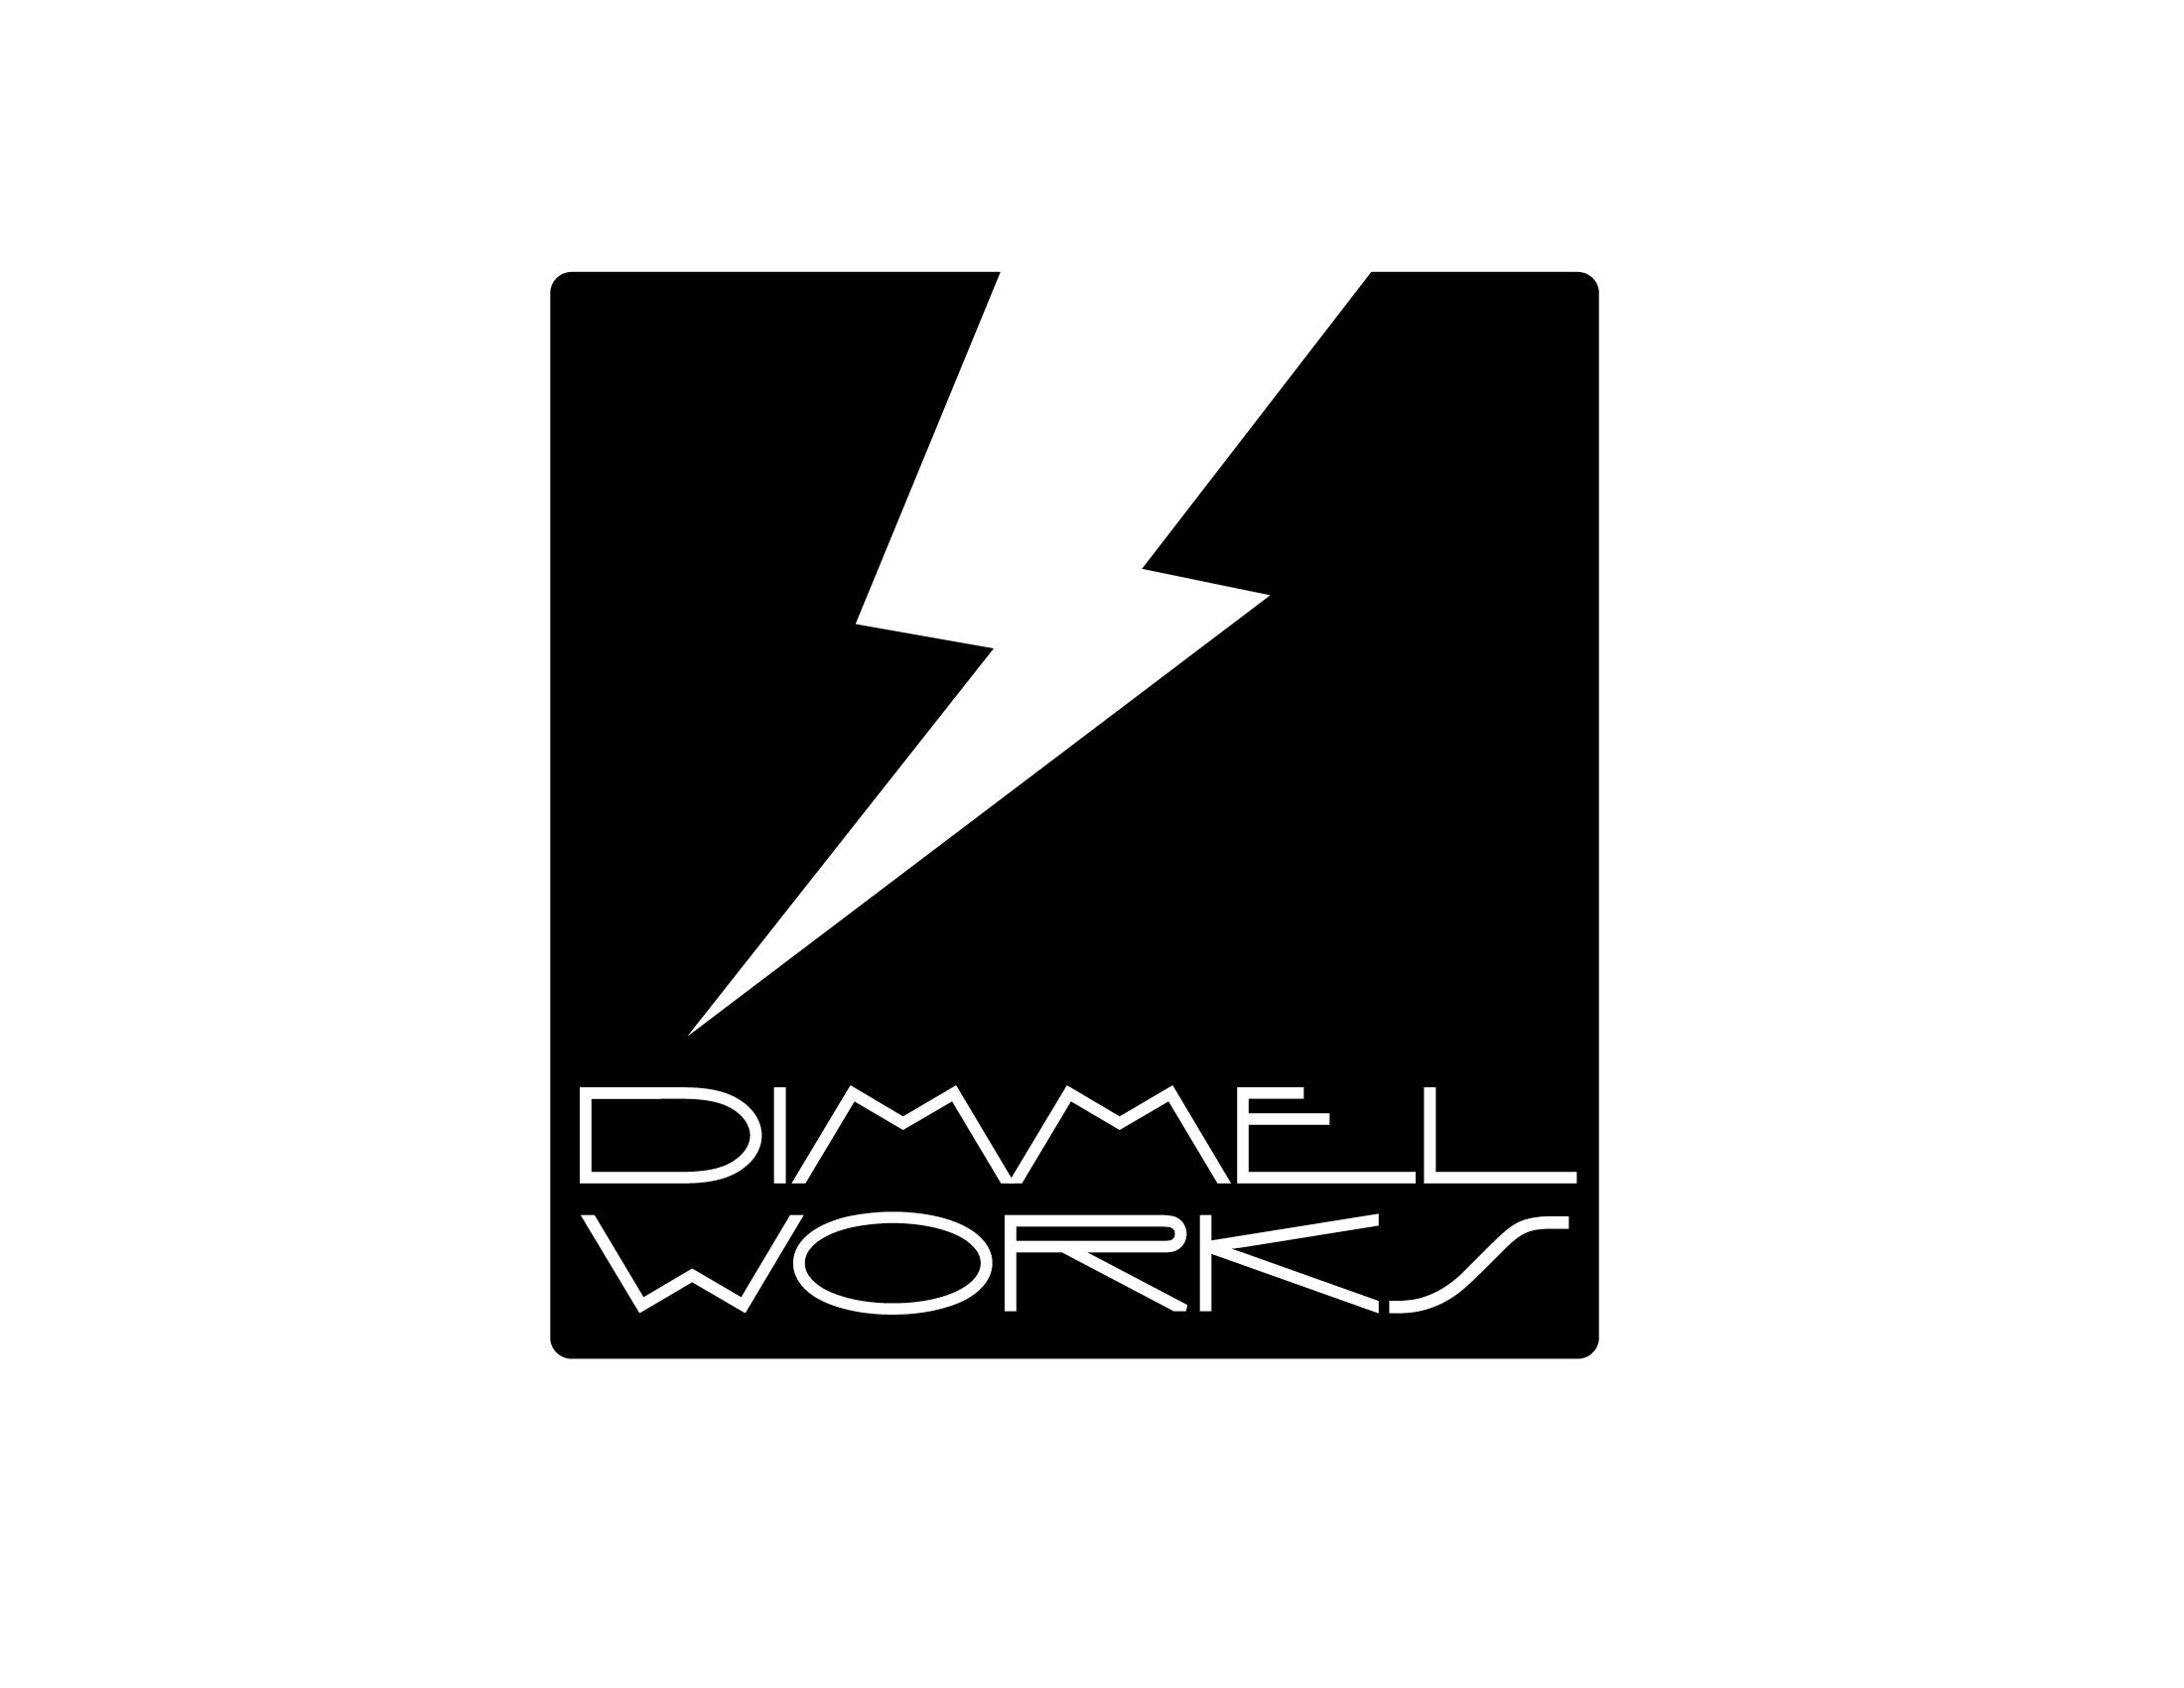 Dimmel Logo